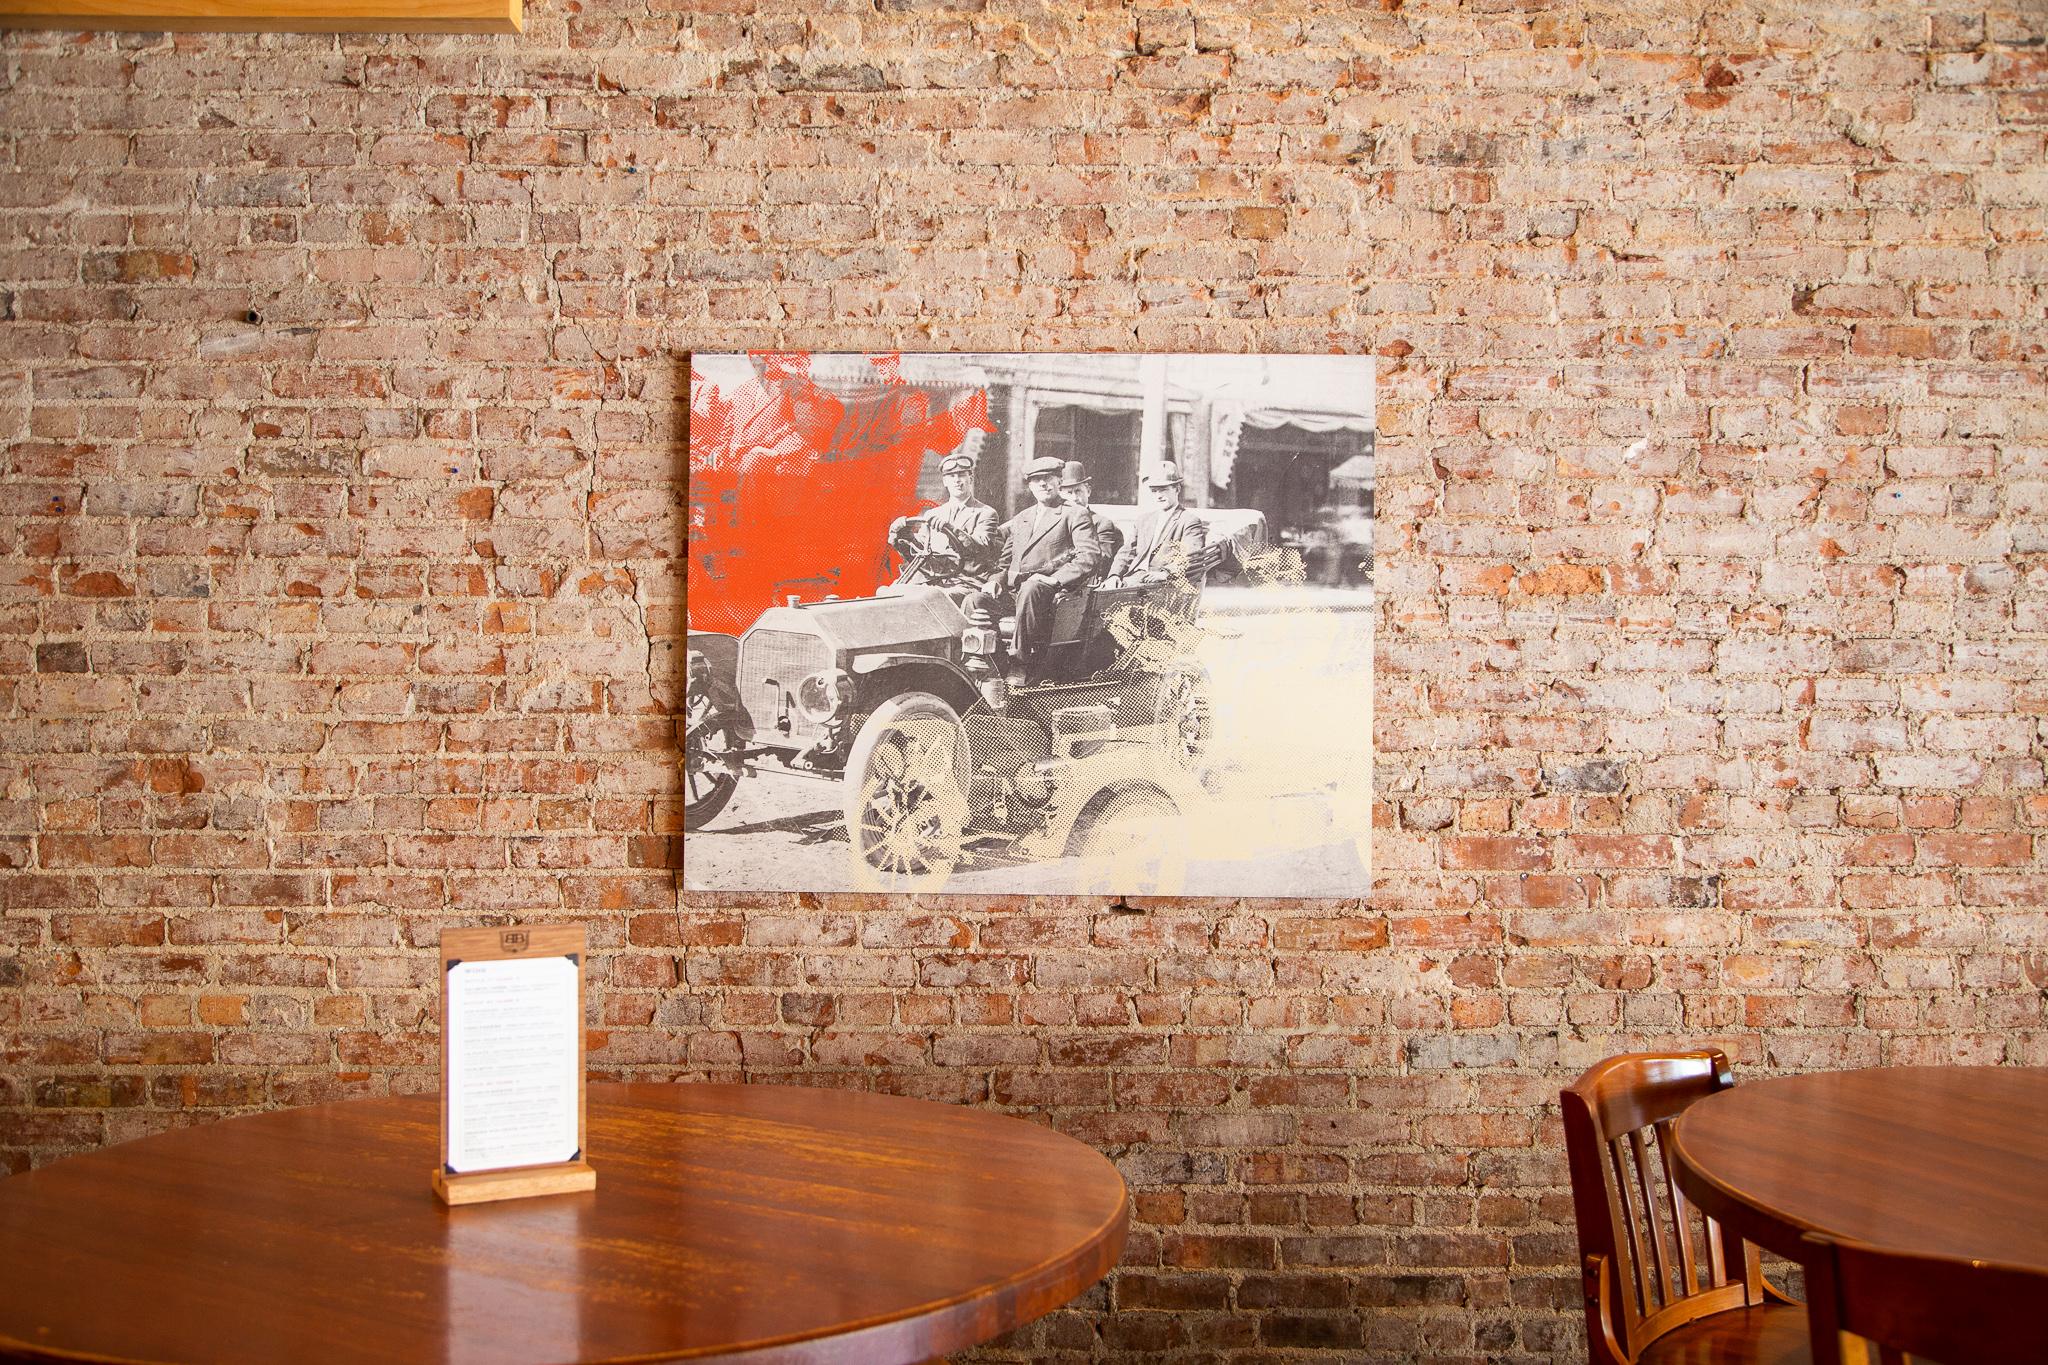 LR_MTRL DSGN_Barley's Bar_190617_0047.jpg